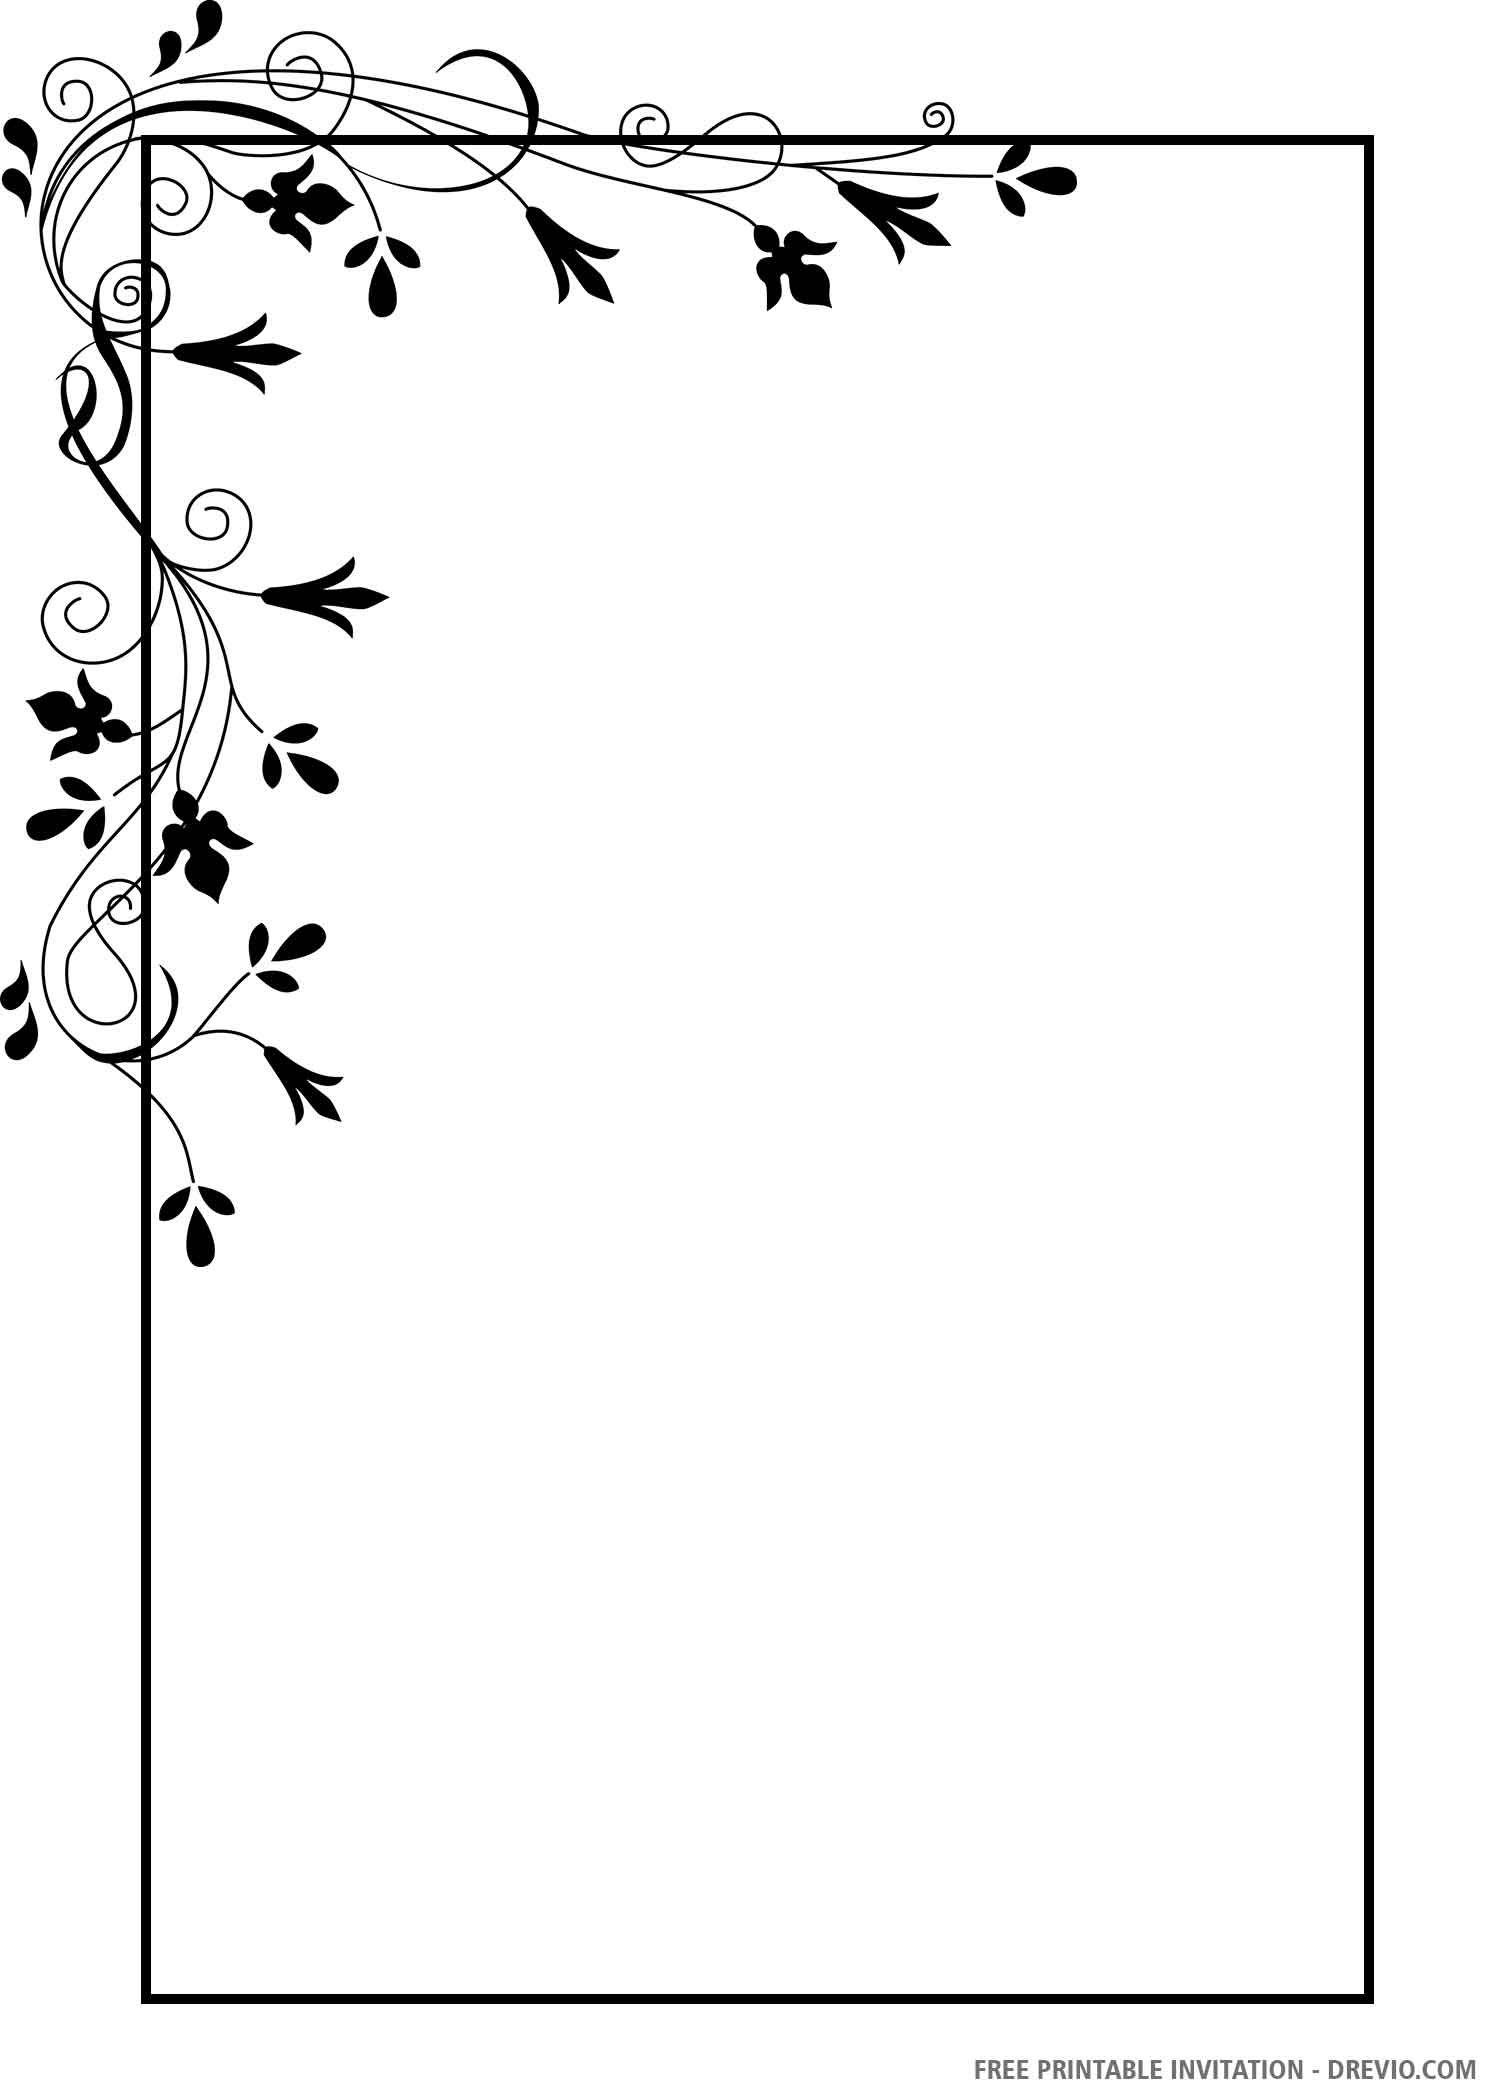 Free Printable Black And White Floral Wedding Invitation Templates Floral Wedding Invitations Colorful Borders Design Invitation Template